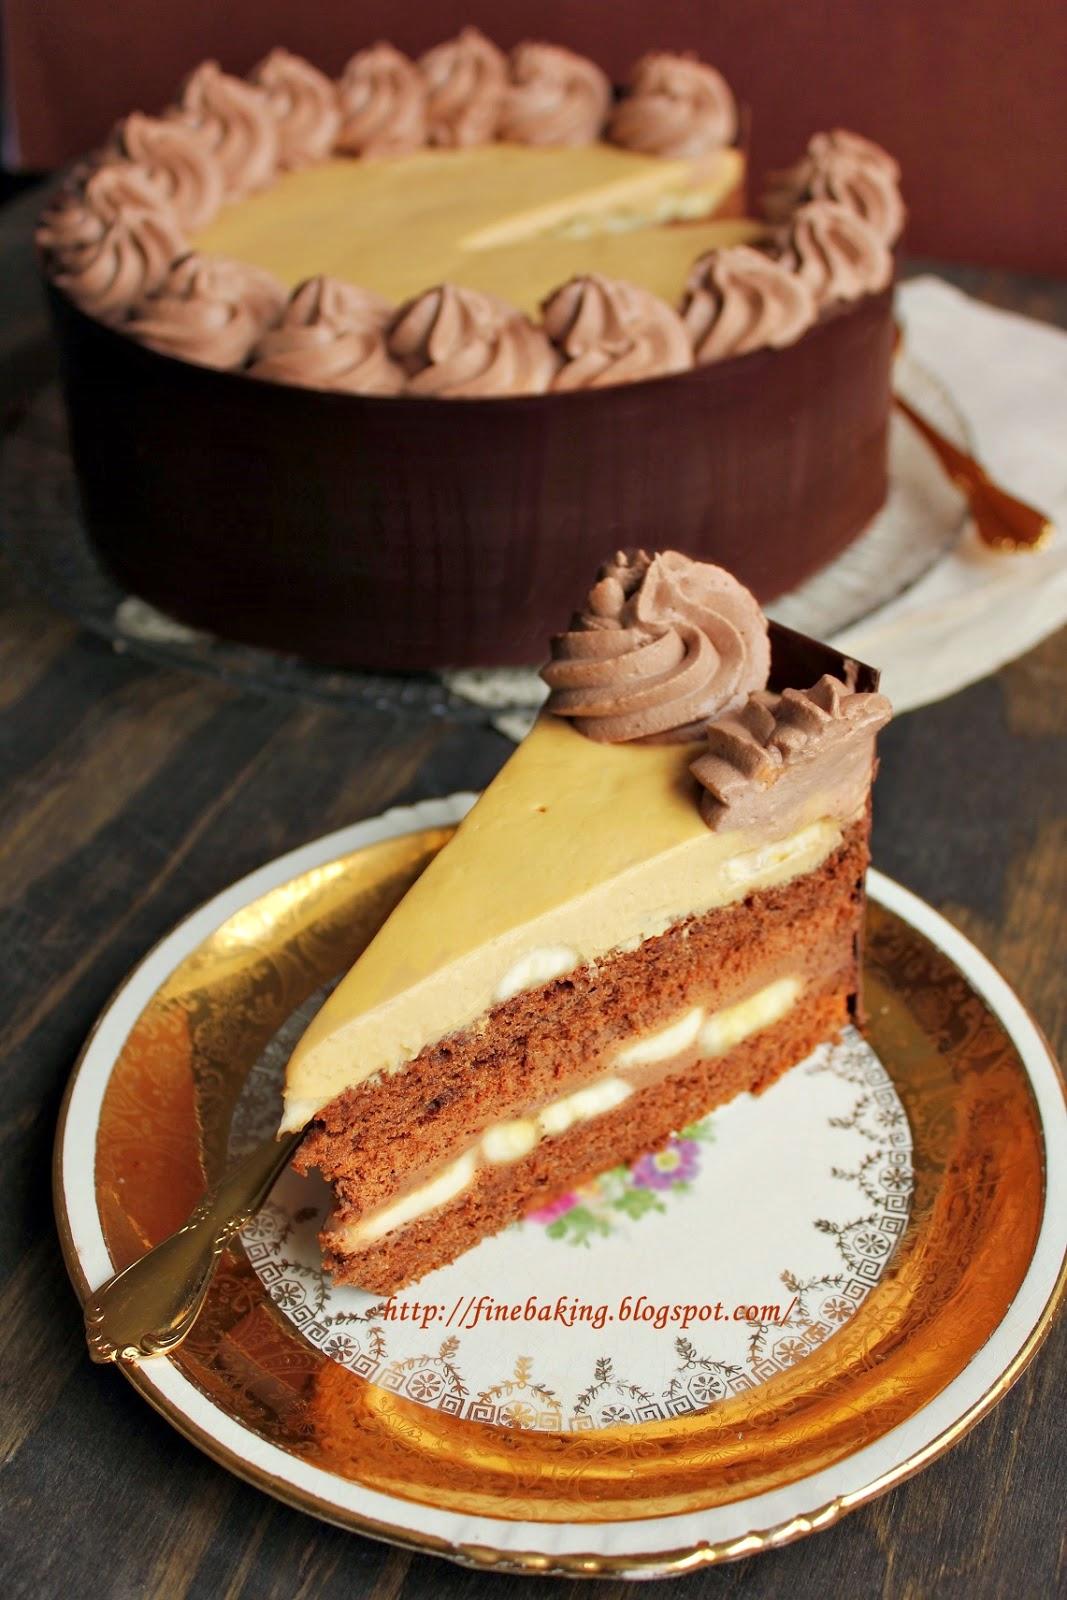 Chocolate Dust Chocolate Caramel Banana Mousse Cake